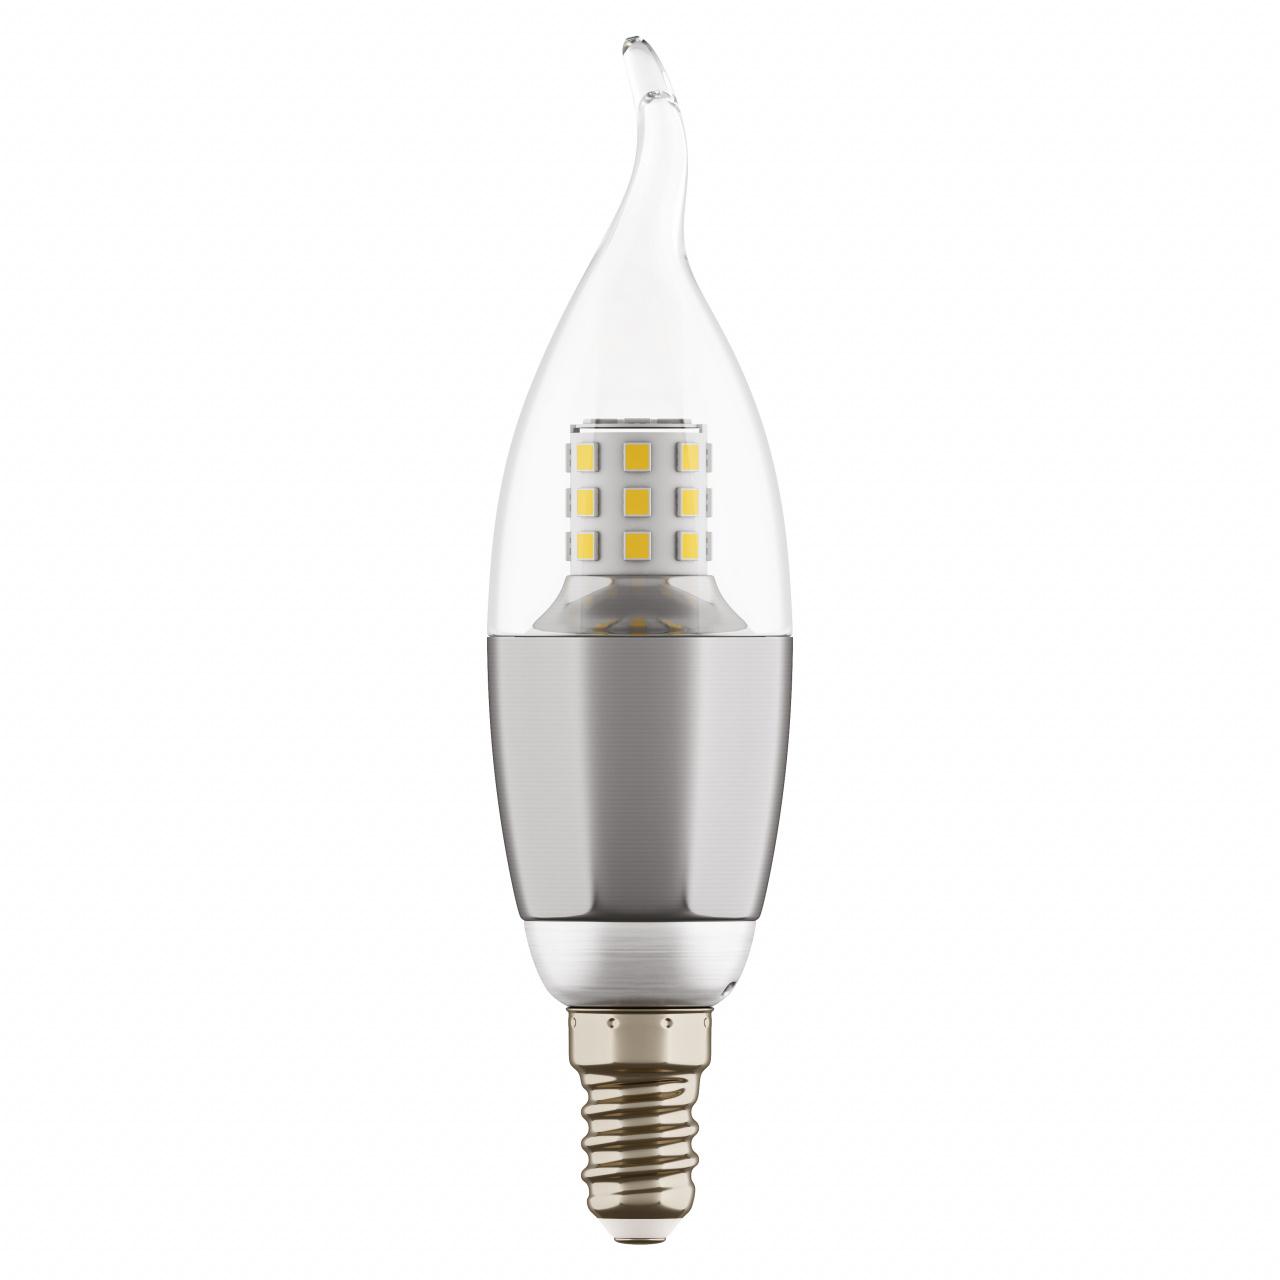 Лампа LED 220V CA35 E14 7W=70W 460LM 60G CL/CH 4000K 20000H Lightstar 940644